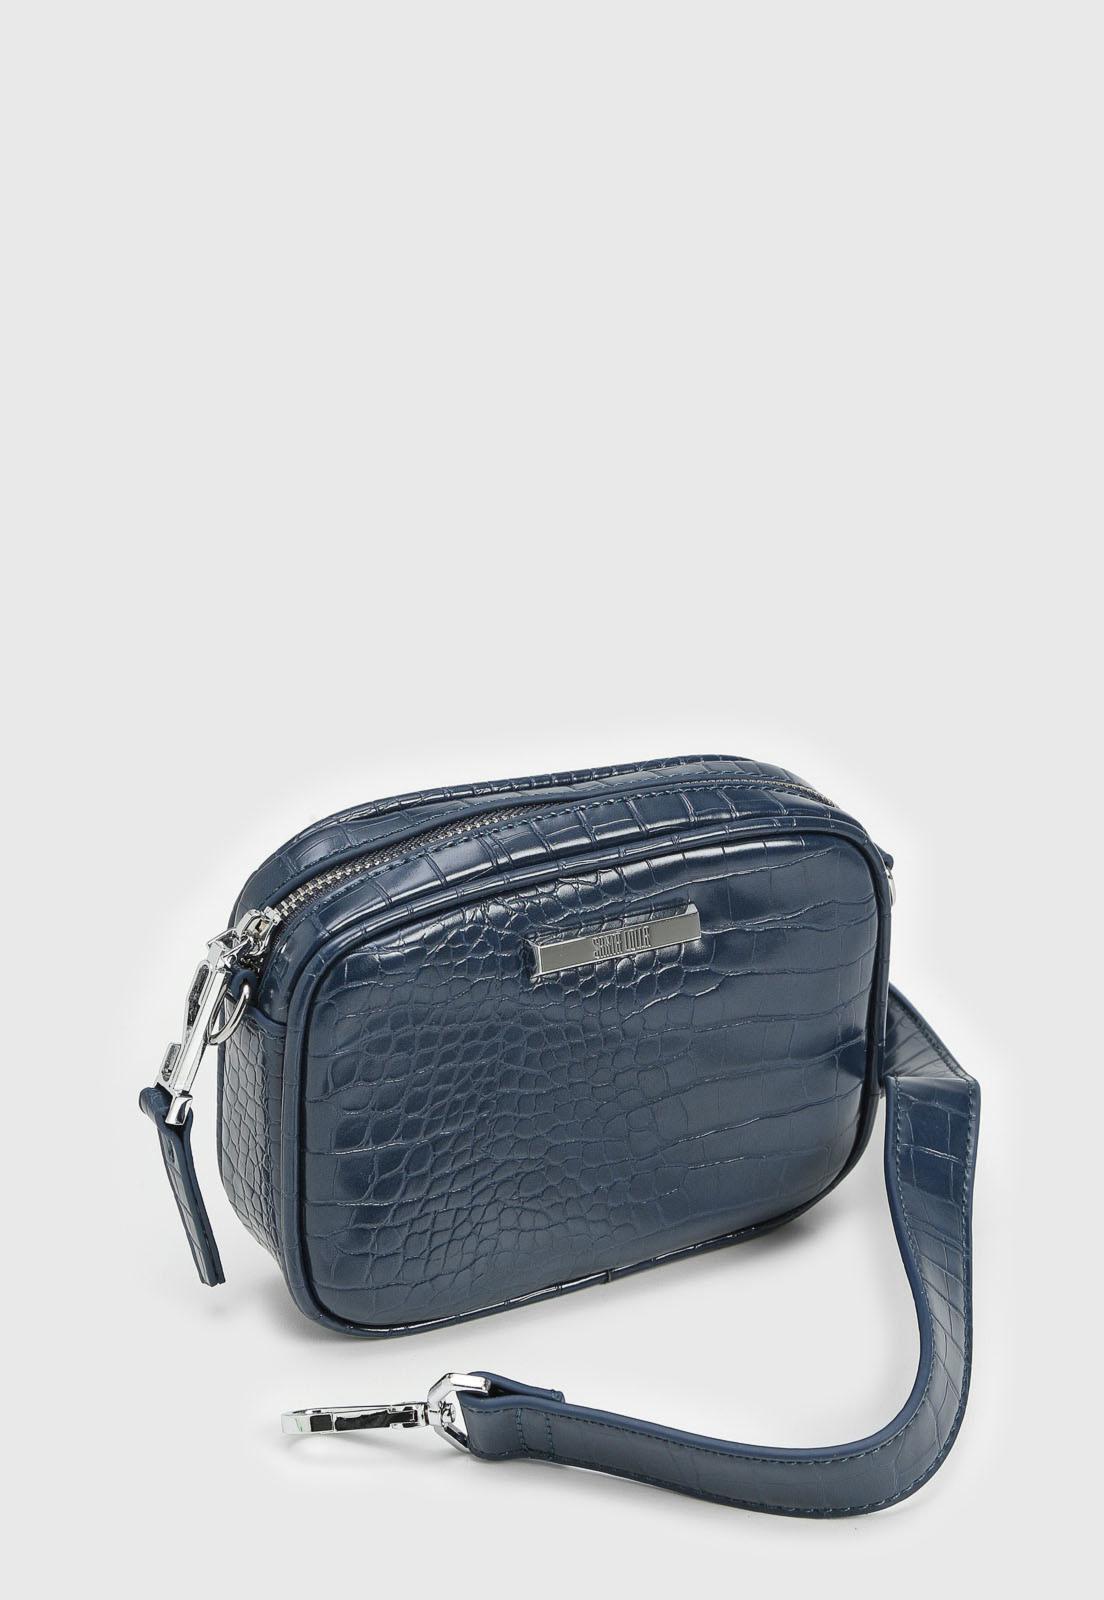 Bolsa Santa Lolla Croco Azul-Marinho Pequena